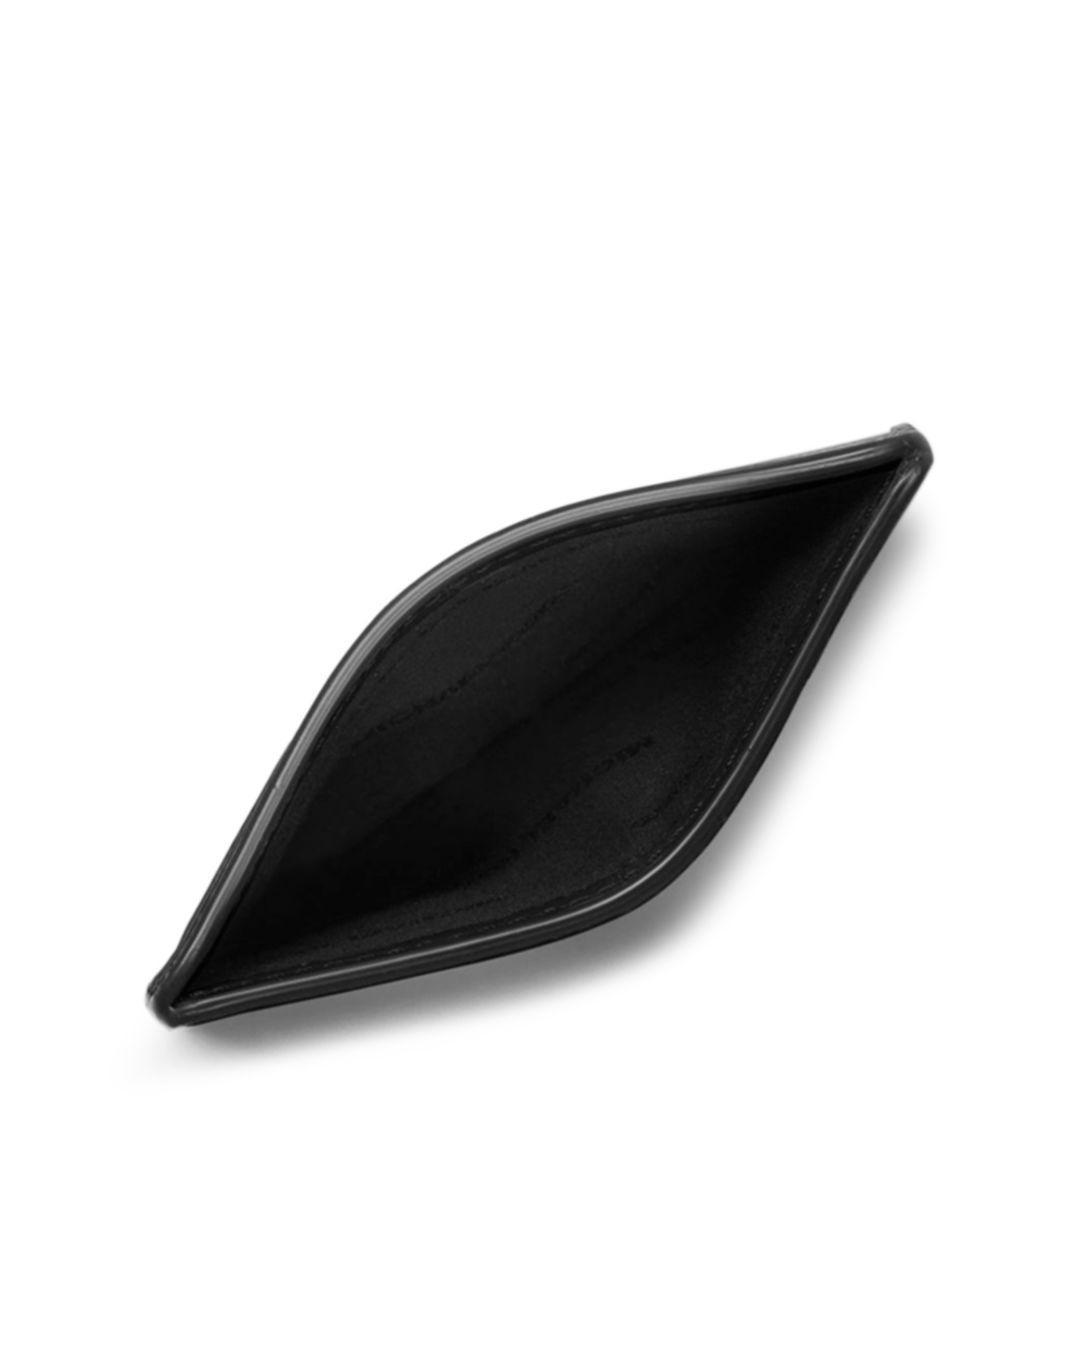 b4c40bbc3ab1 Michael Kors Harrison Cross Grain Leather Card Case in Black for Men - Lyst